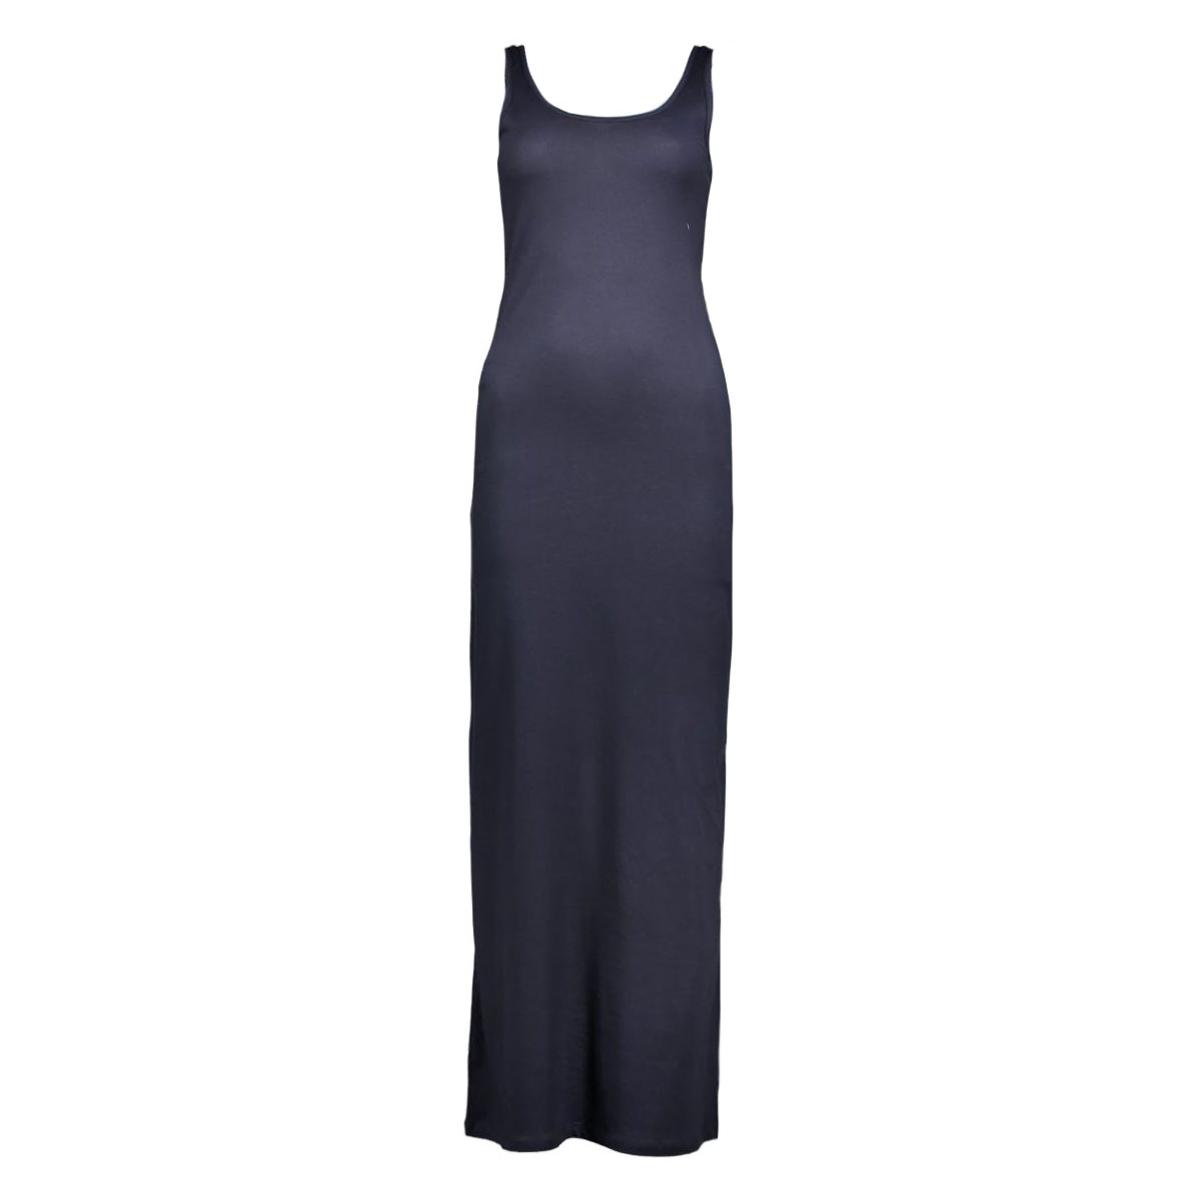 onlabbie sl long tank oneck dress 15109391 only jurk night sky